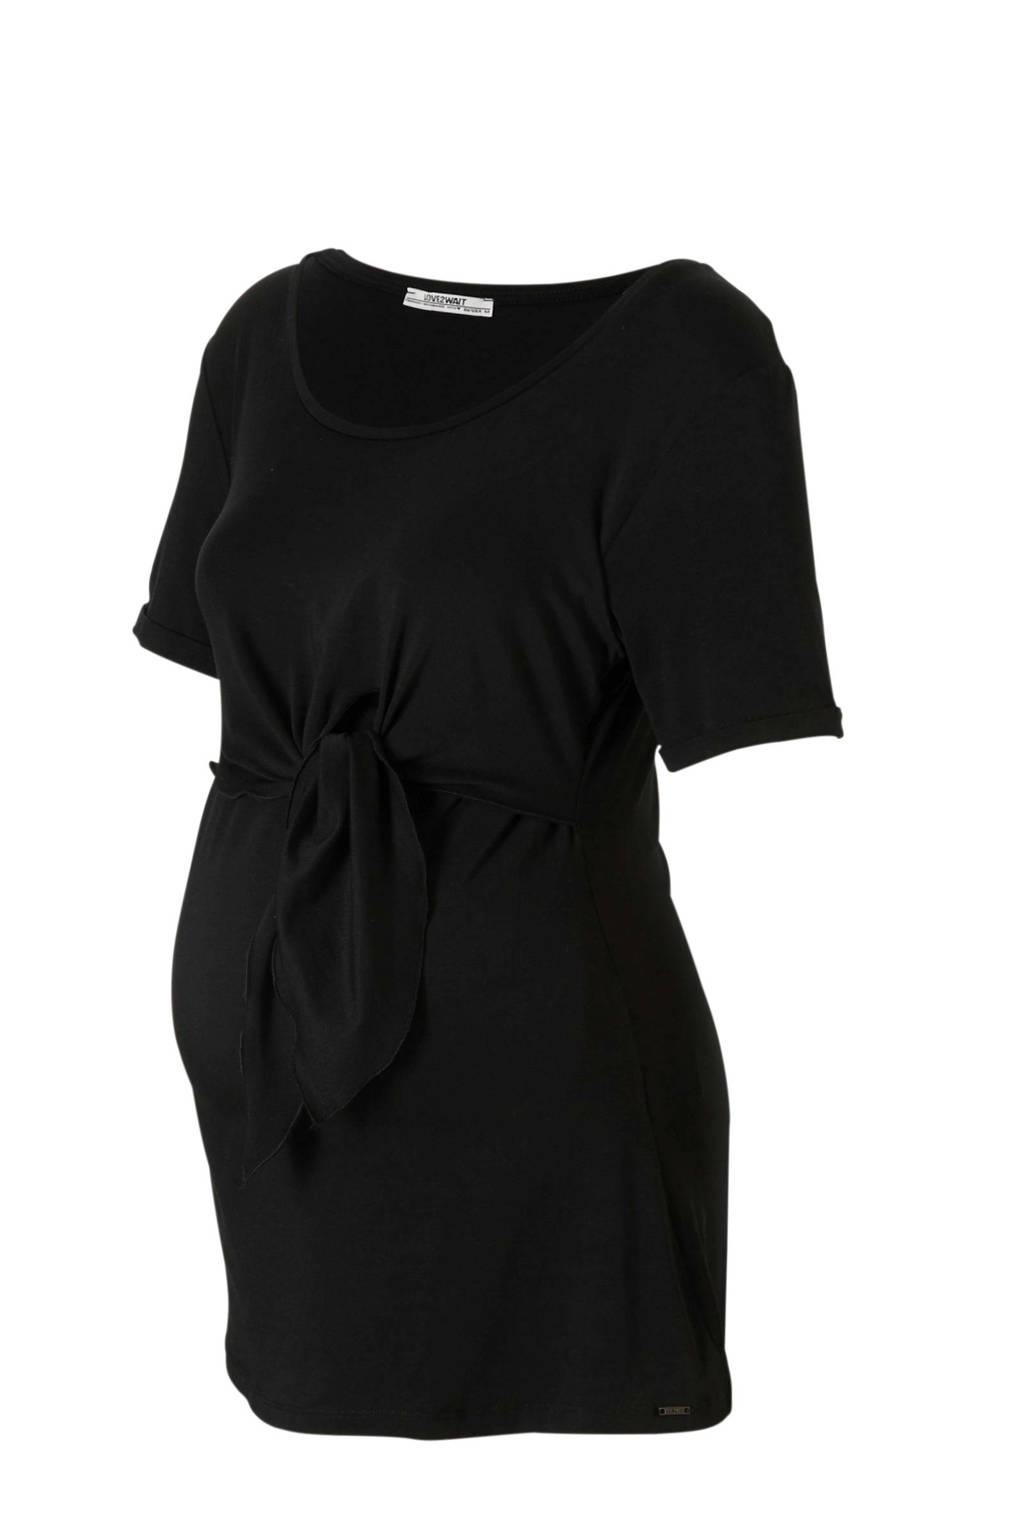 LOVE2WAIT zwangerschap + voedings T-shirt met knoop zwart, Zwart